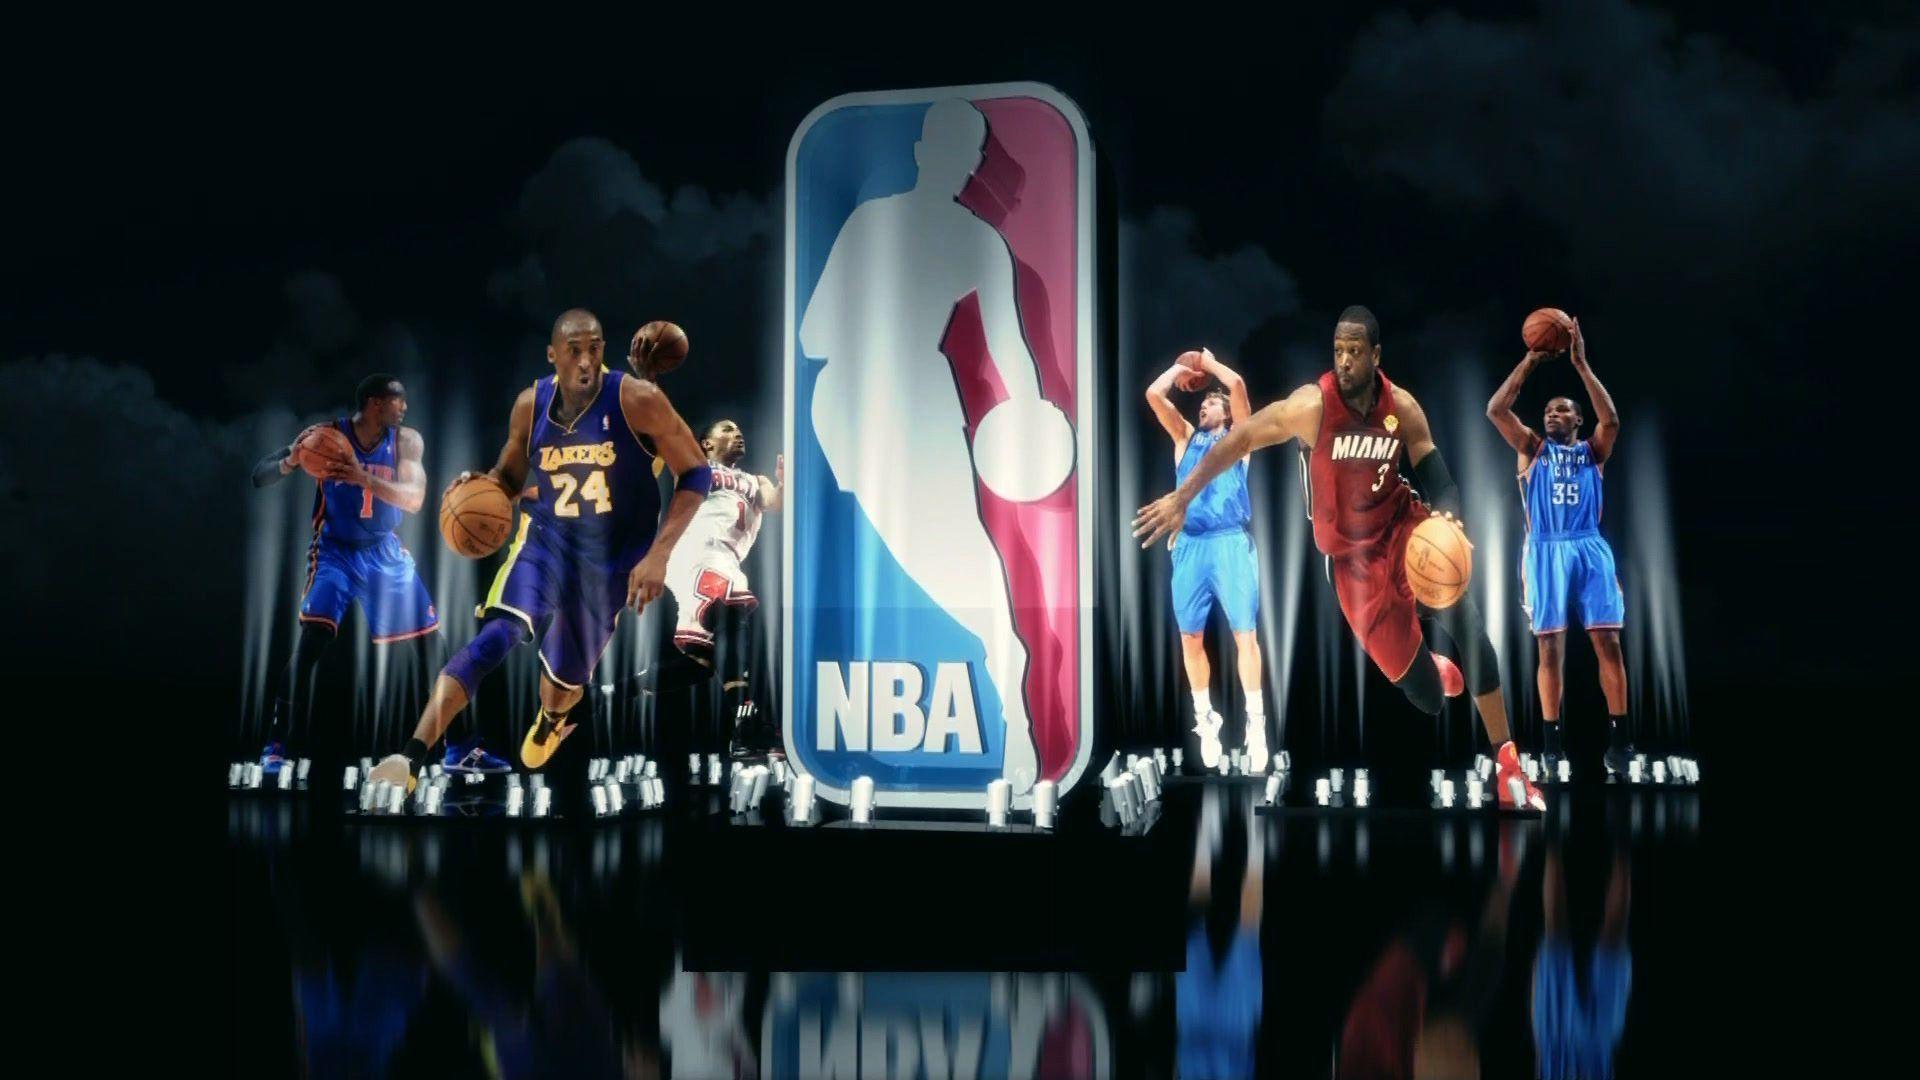 Cool Nba Players Wallpapers: NBA Wallpapers 2016